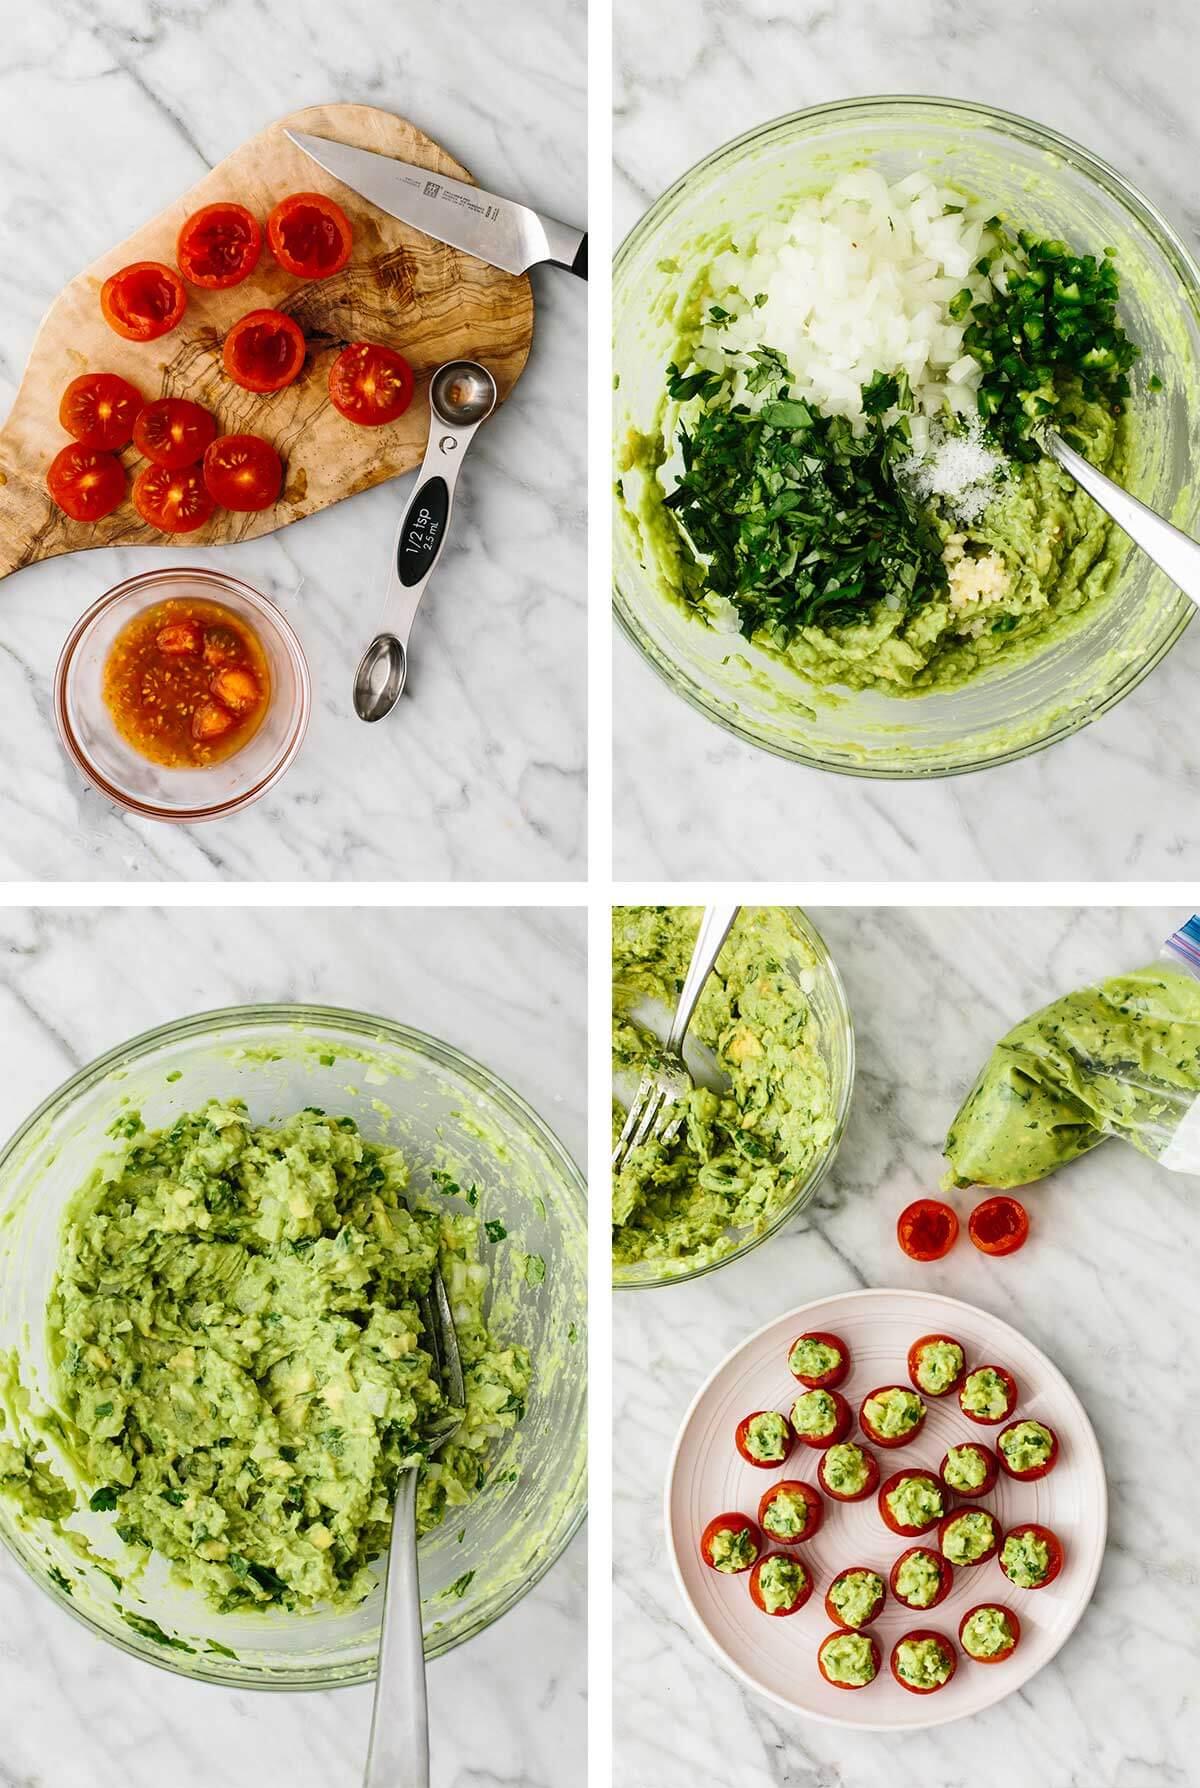 Mixing guacamole in a bowl and making guacamole stuffed tomatoes.